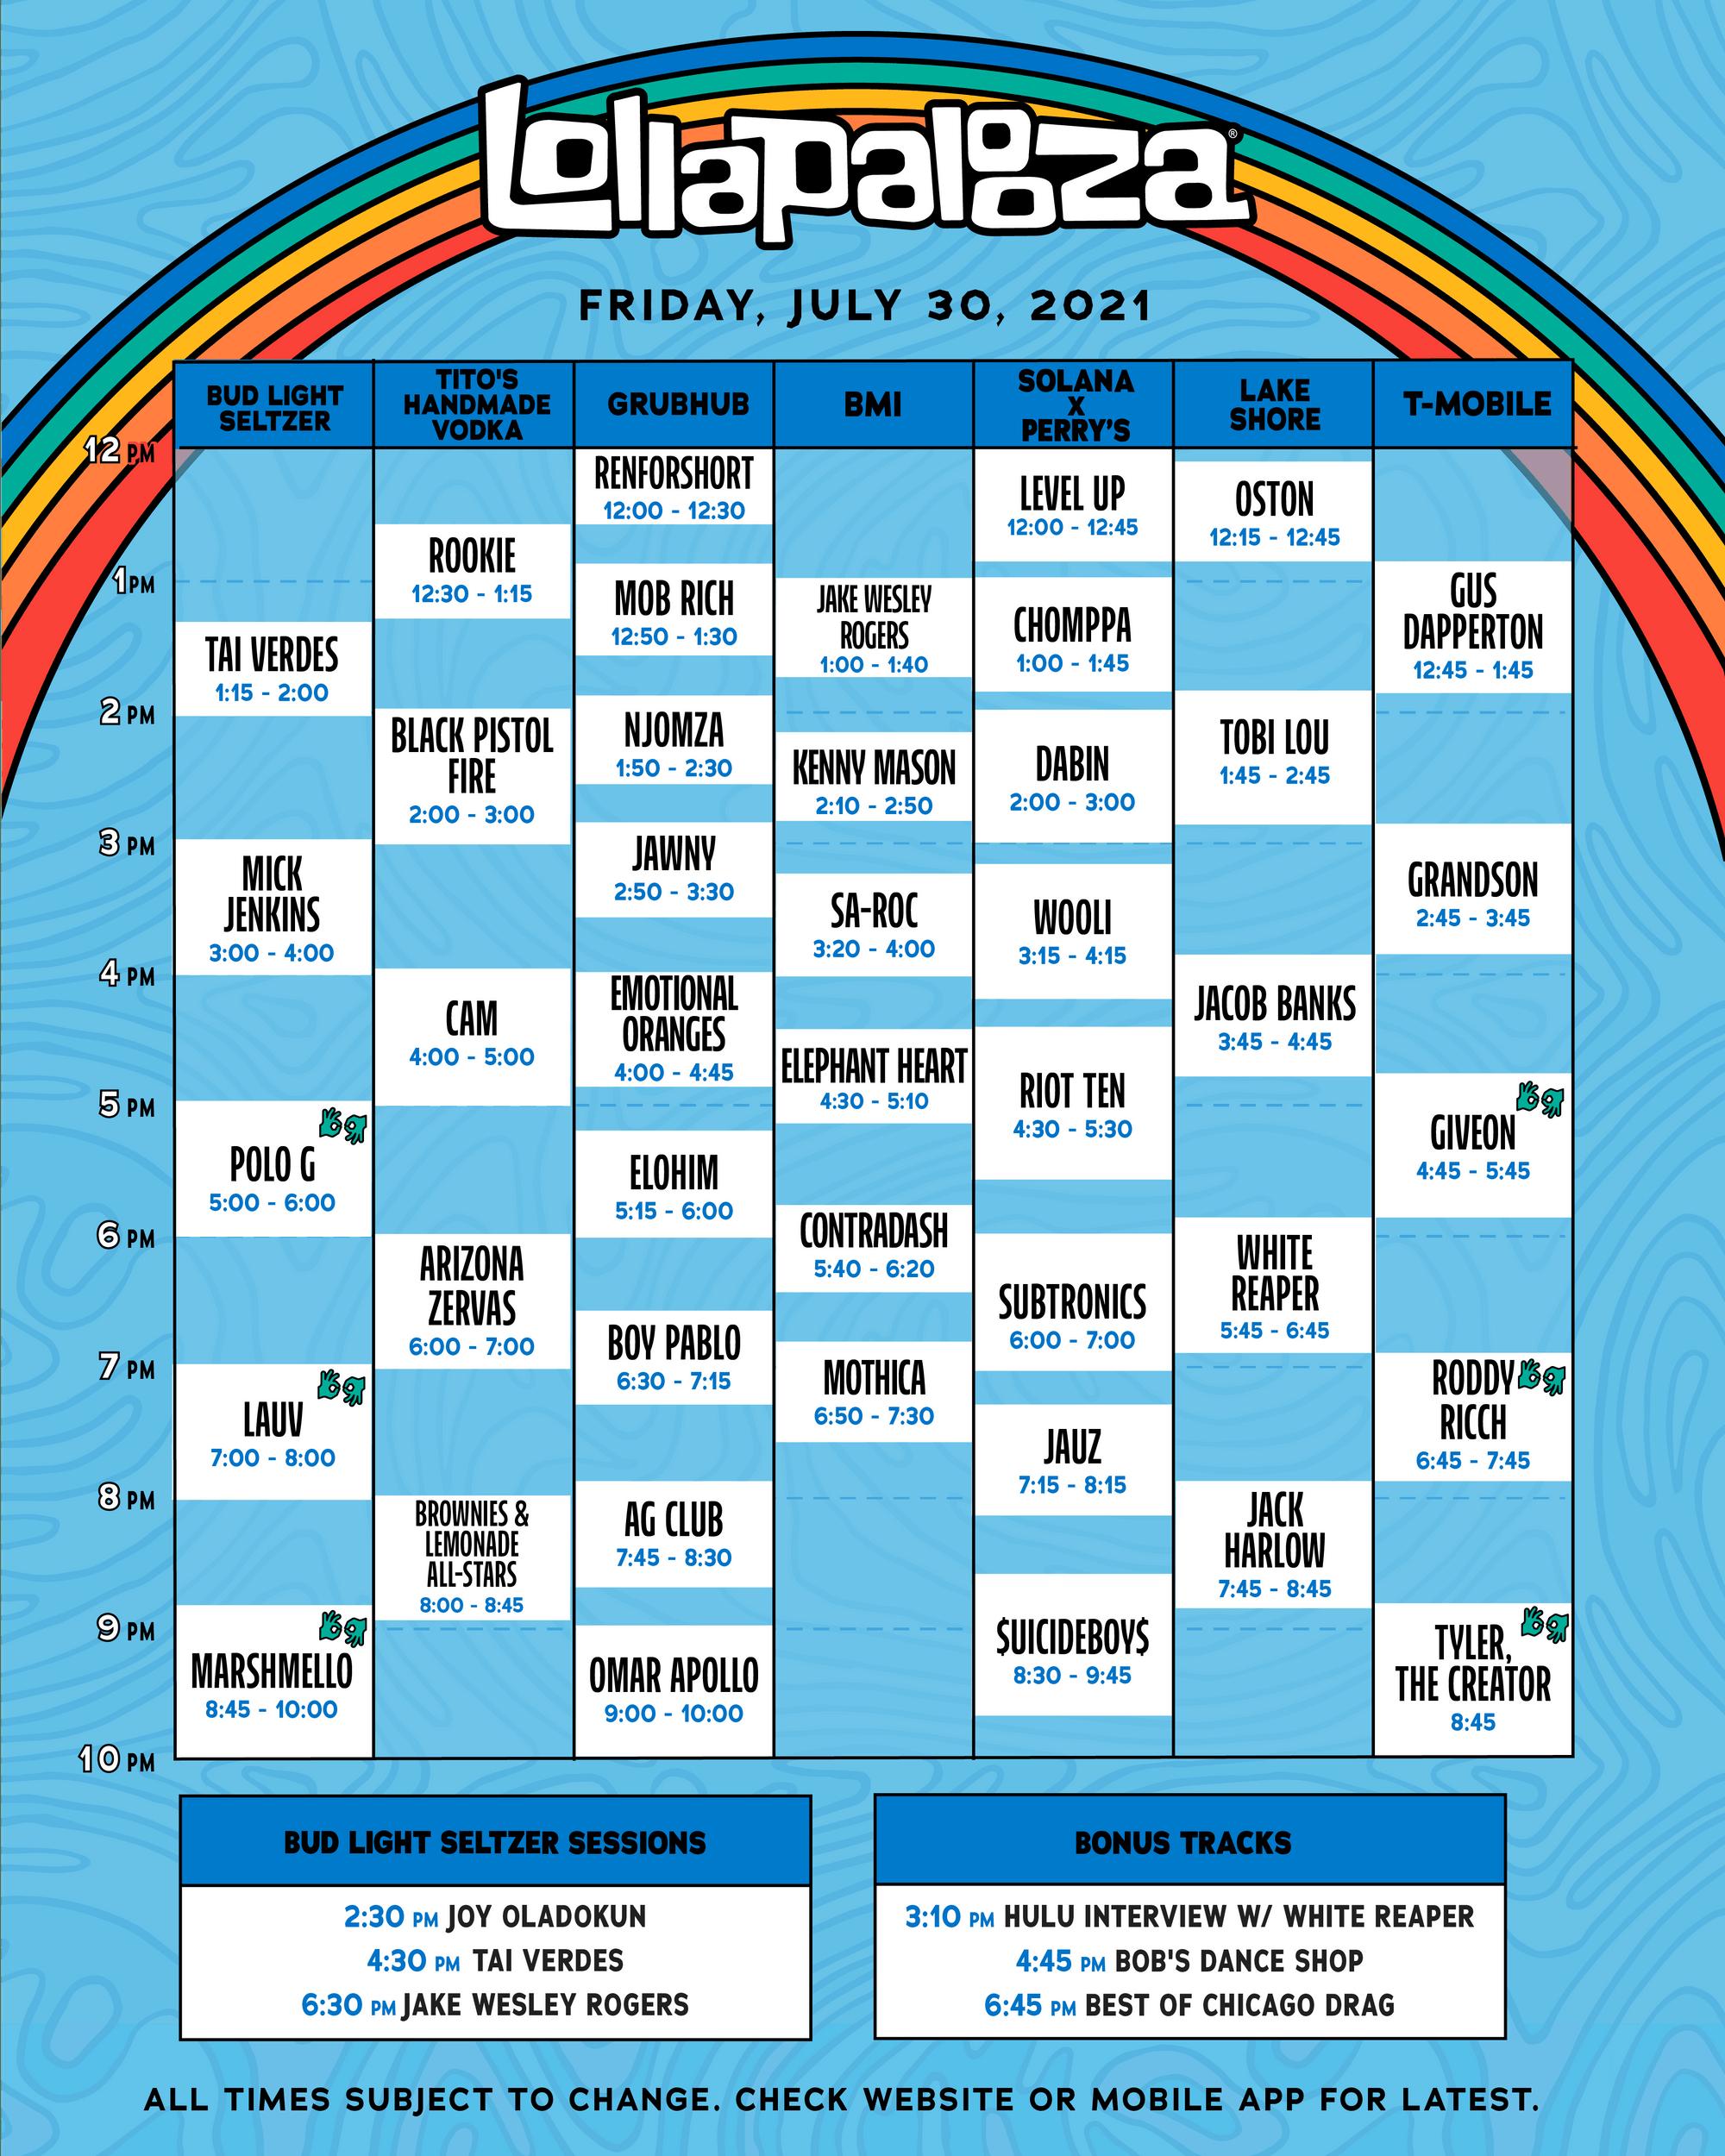 lollapalooza 2021 schedule